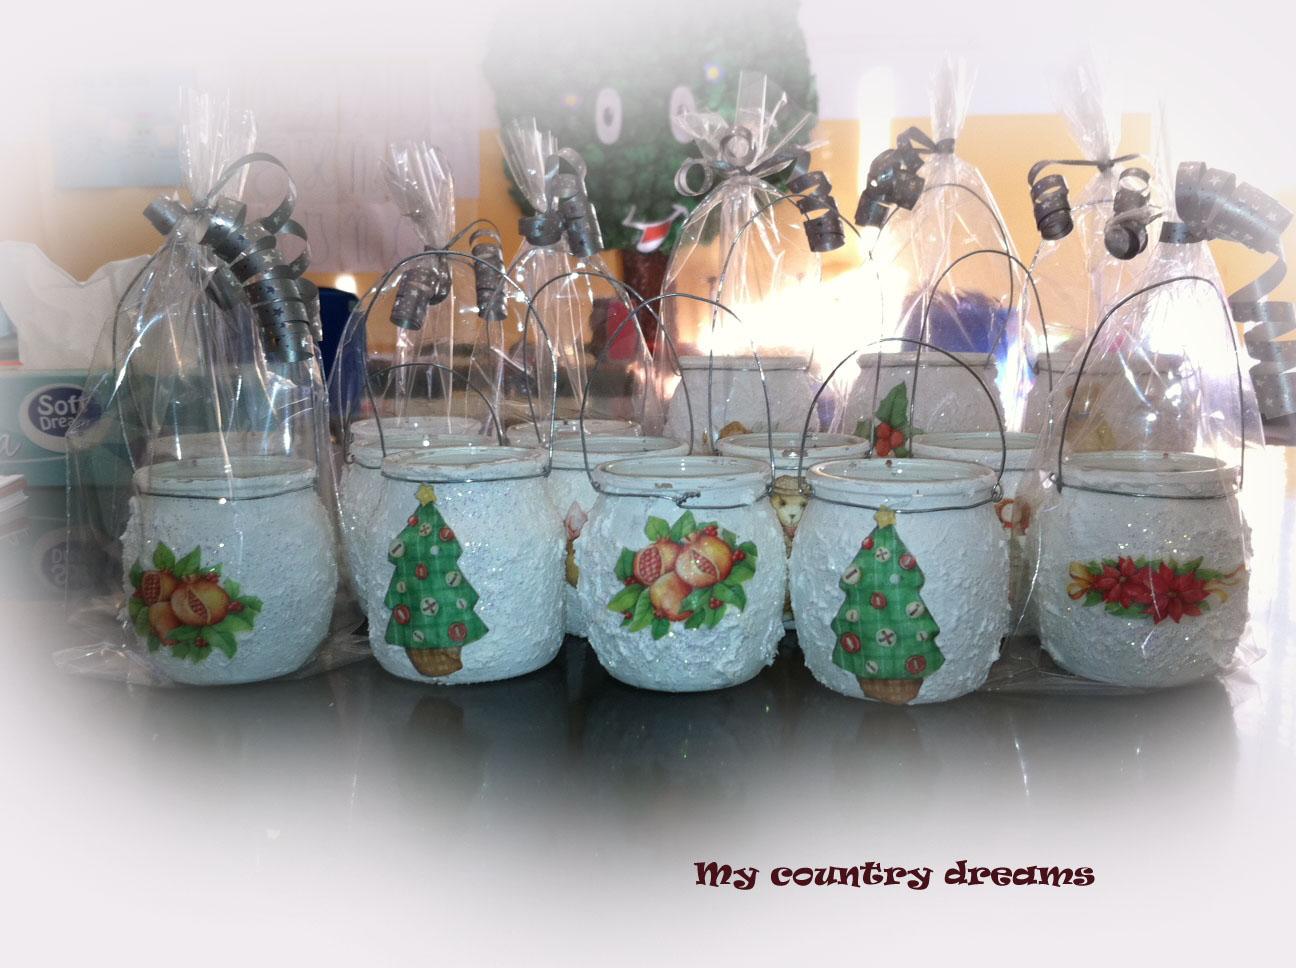 Assez Un cuore country: Lanterne natalizie RU51